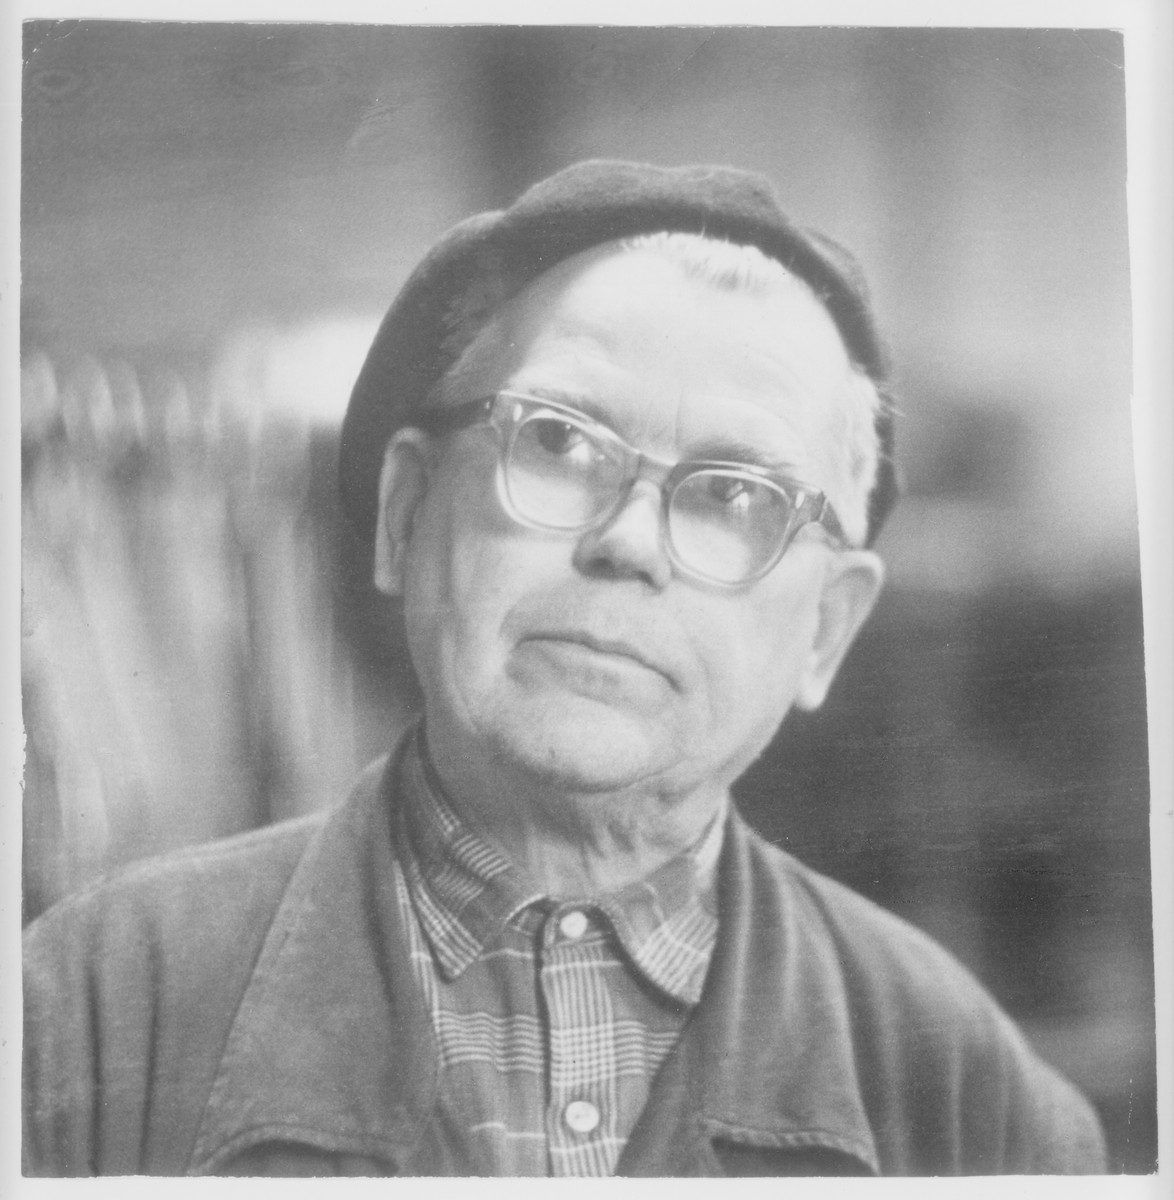 Postwar photograph Lithuanian rescuer, Vytautas Rinkevicius.